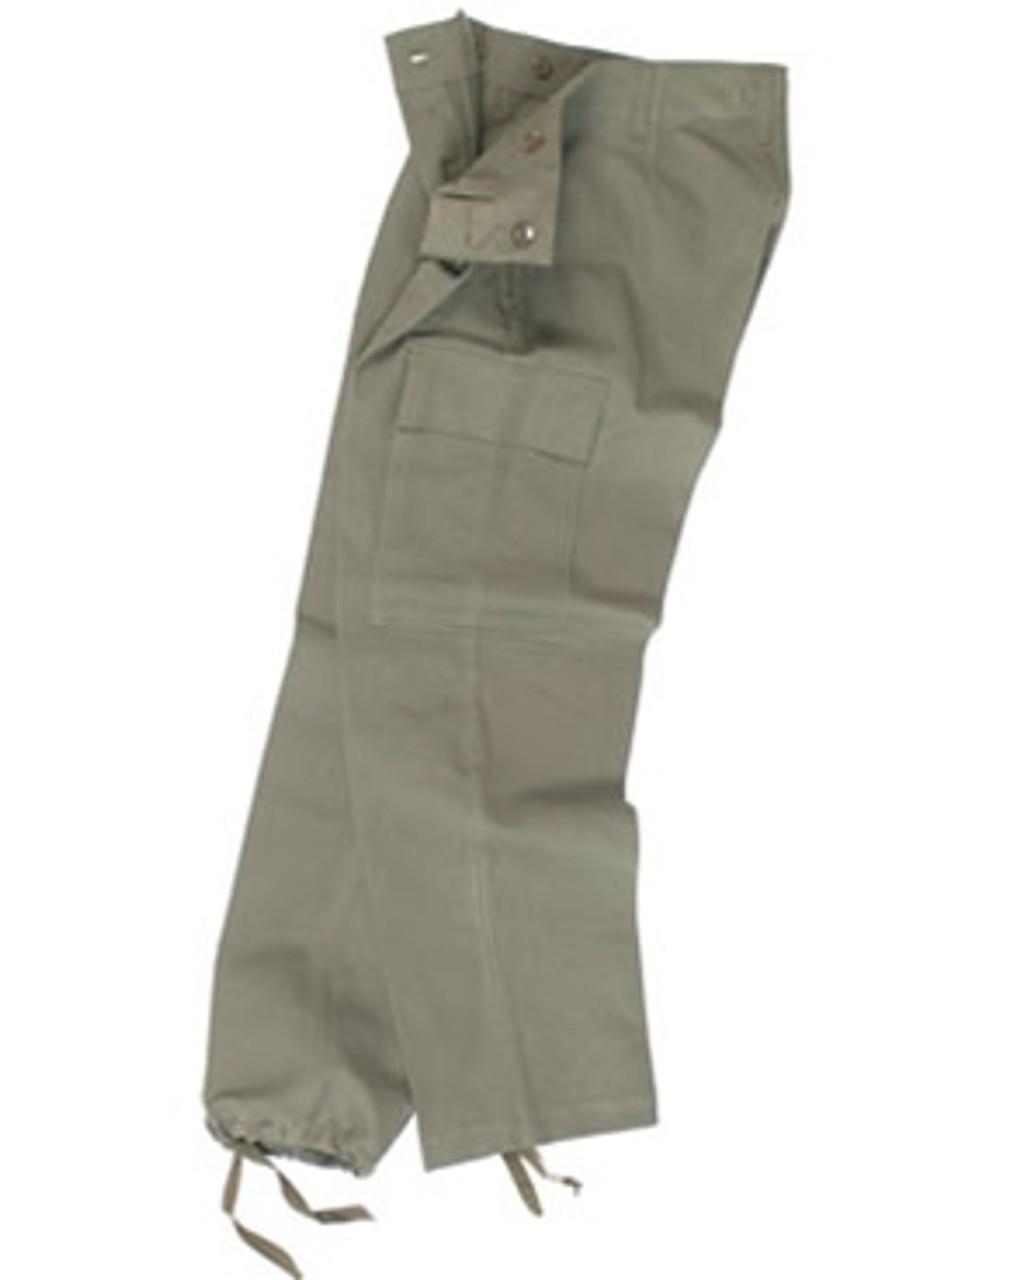 Bundeswehr Moleskin Trousers from Hessen Antique